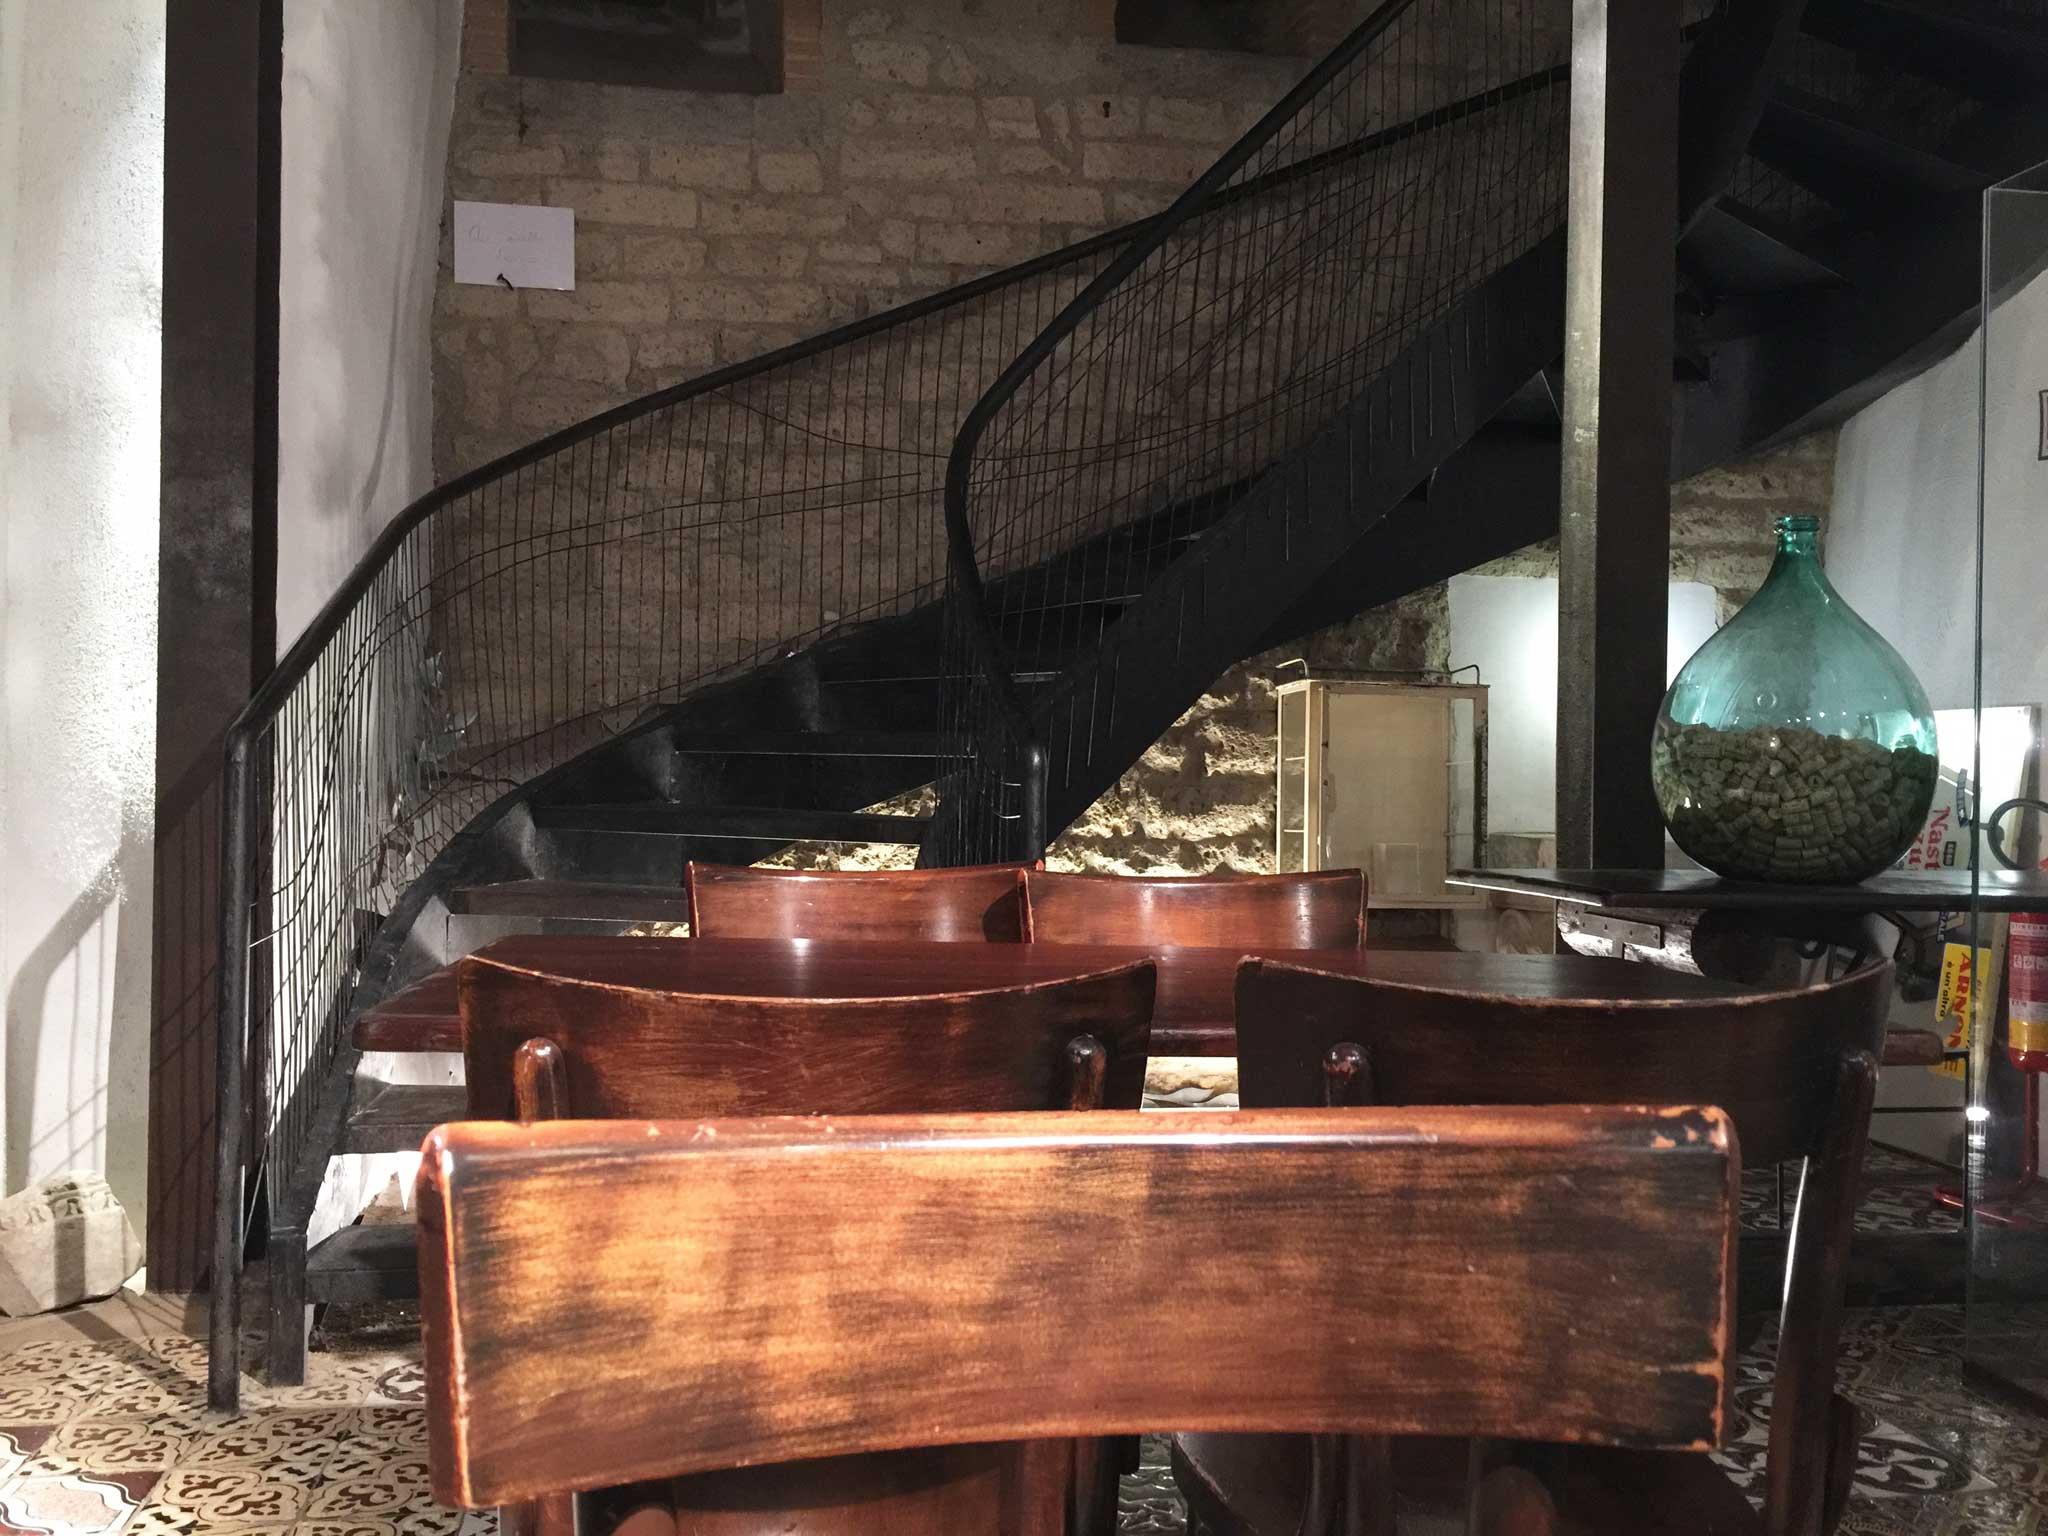 Quattro Tavoli Gino Sorbillo